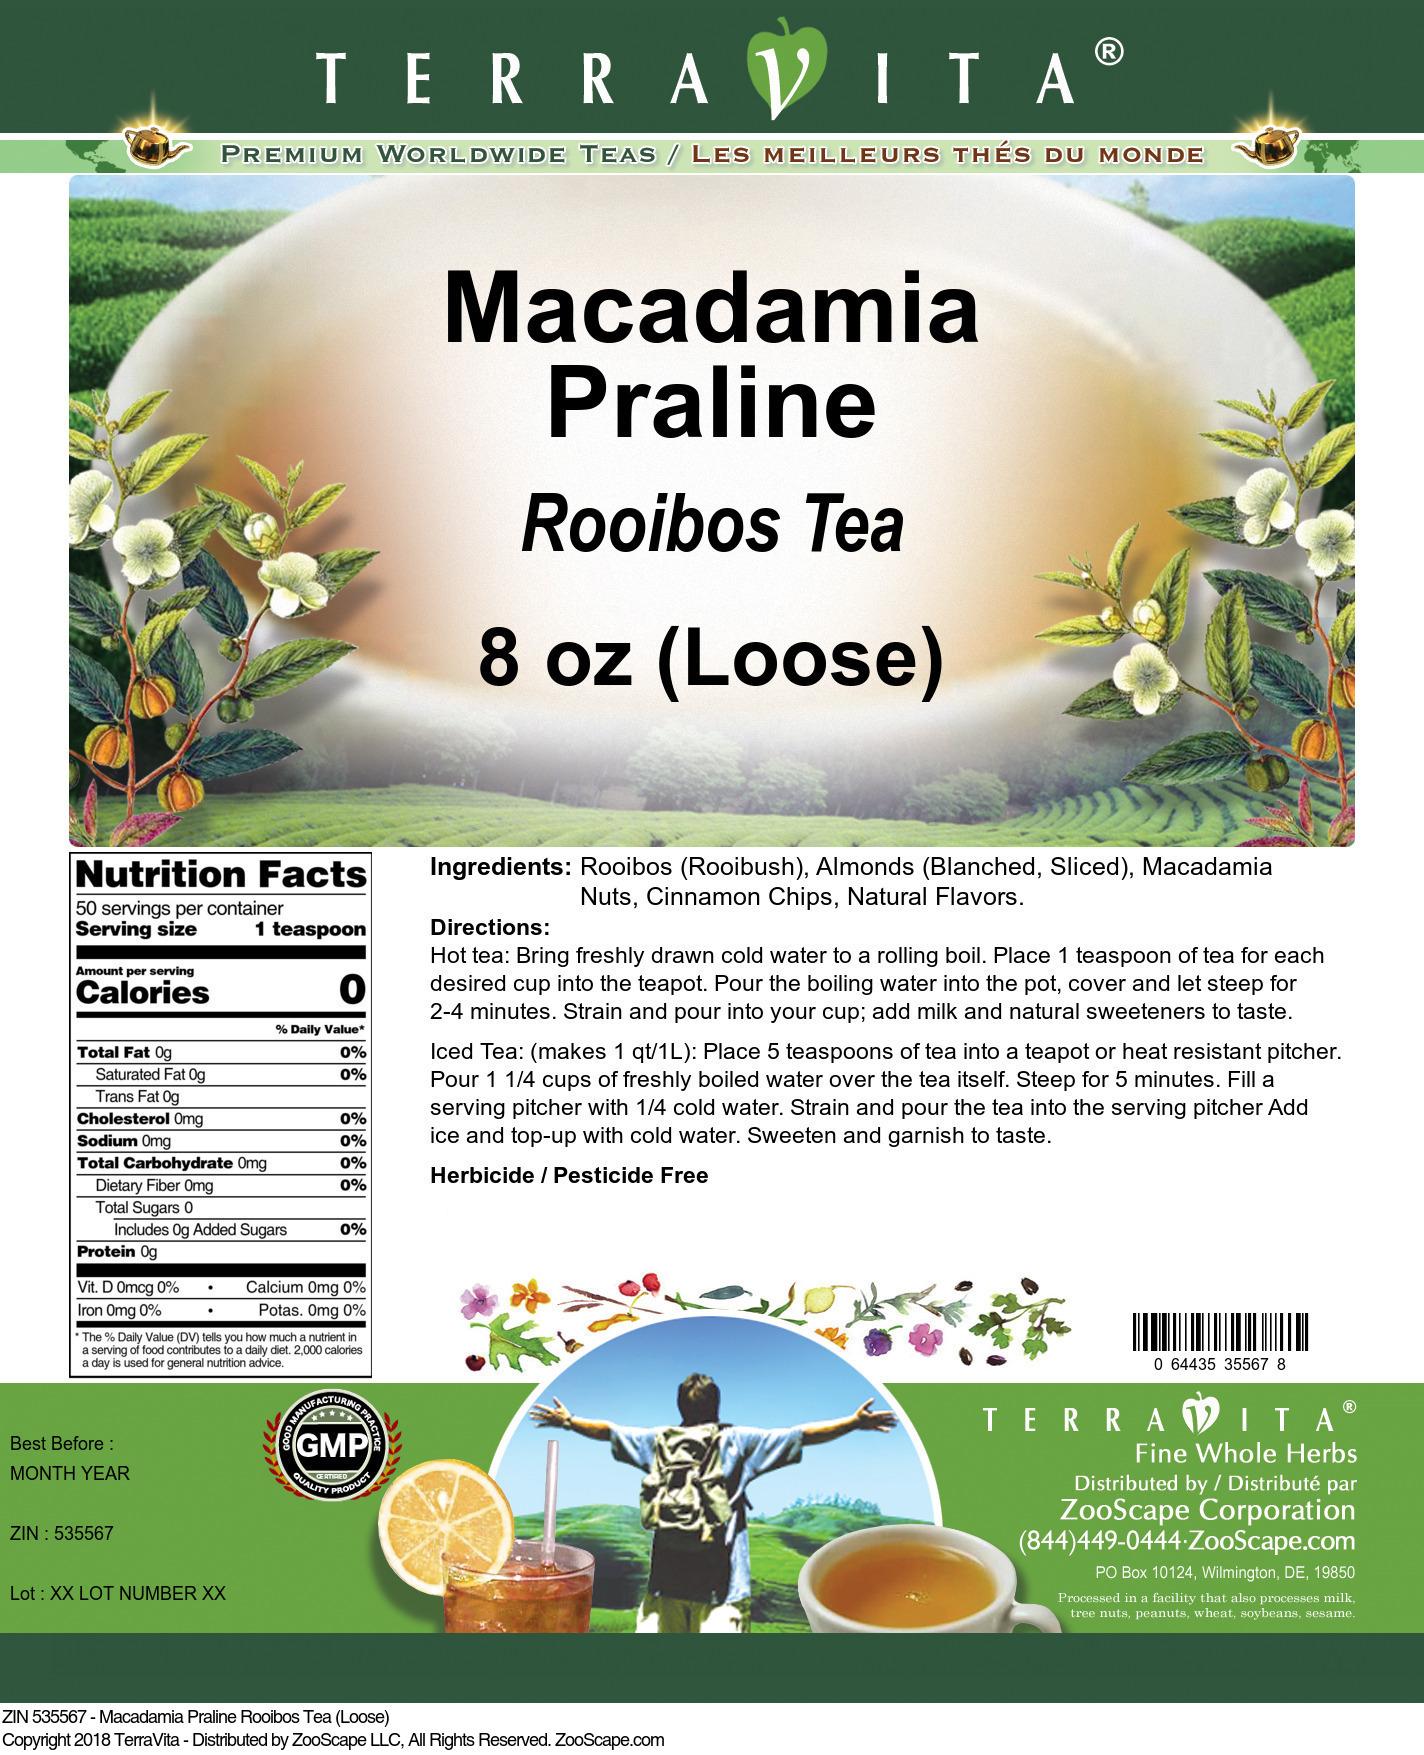 Macadamia Praline Rooibos Tea